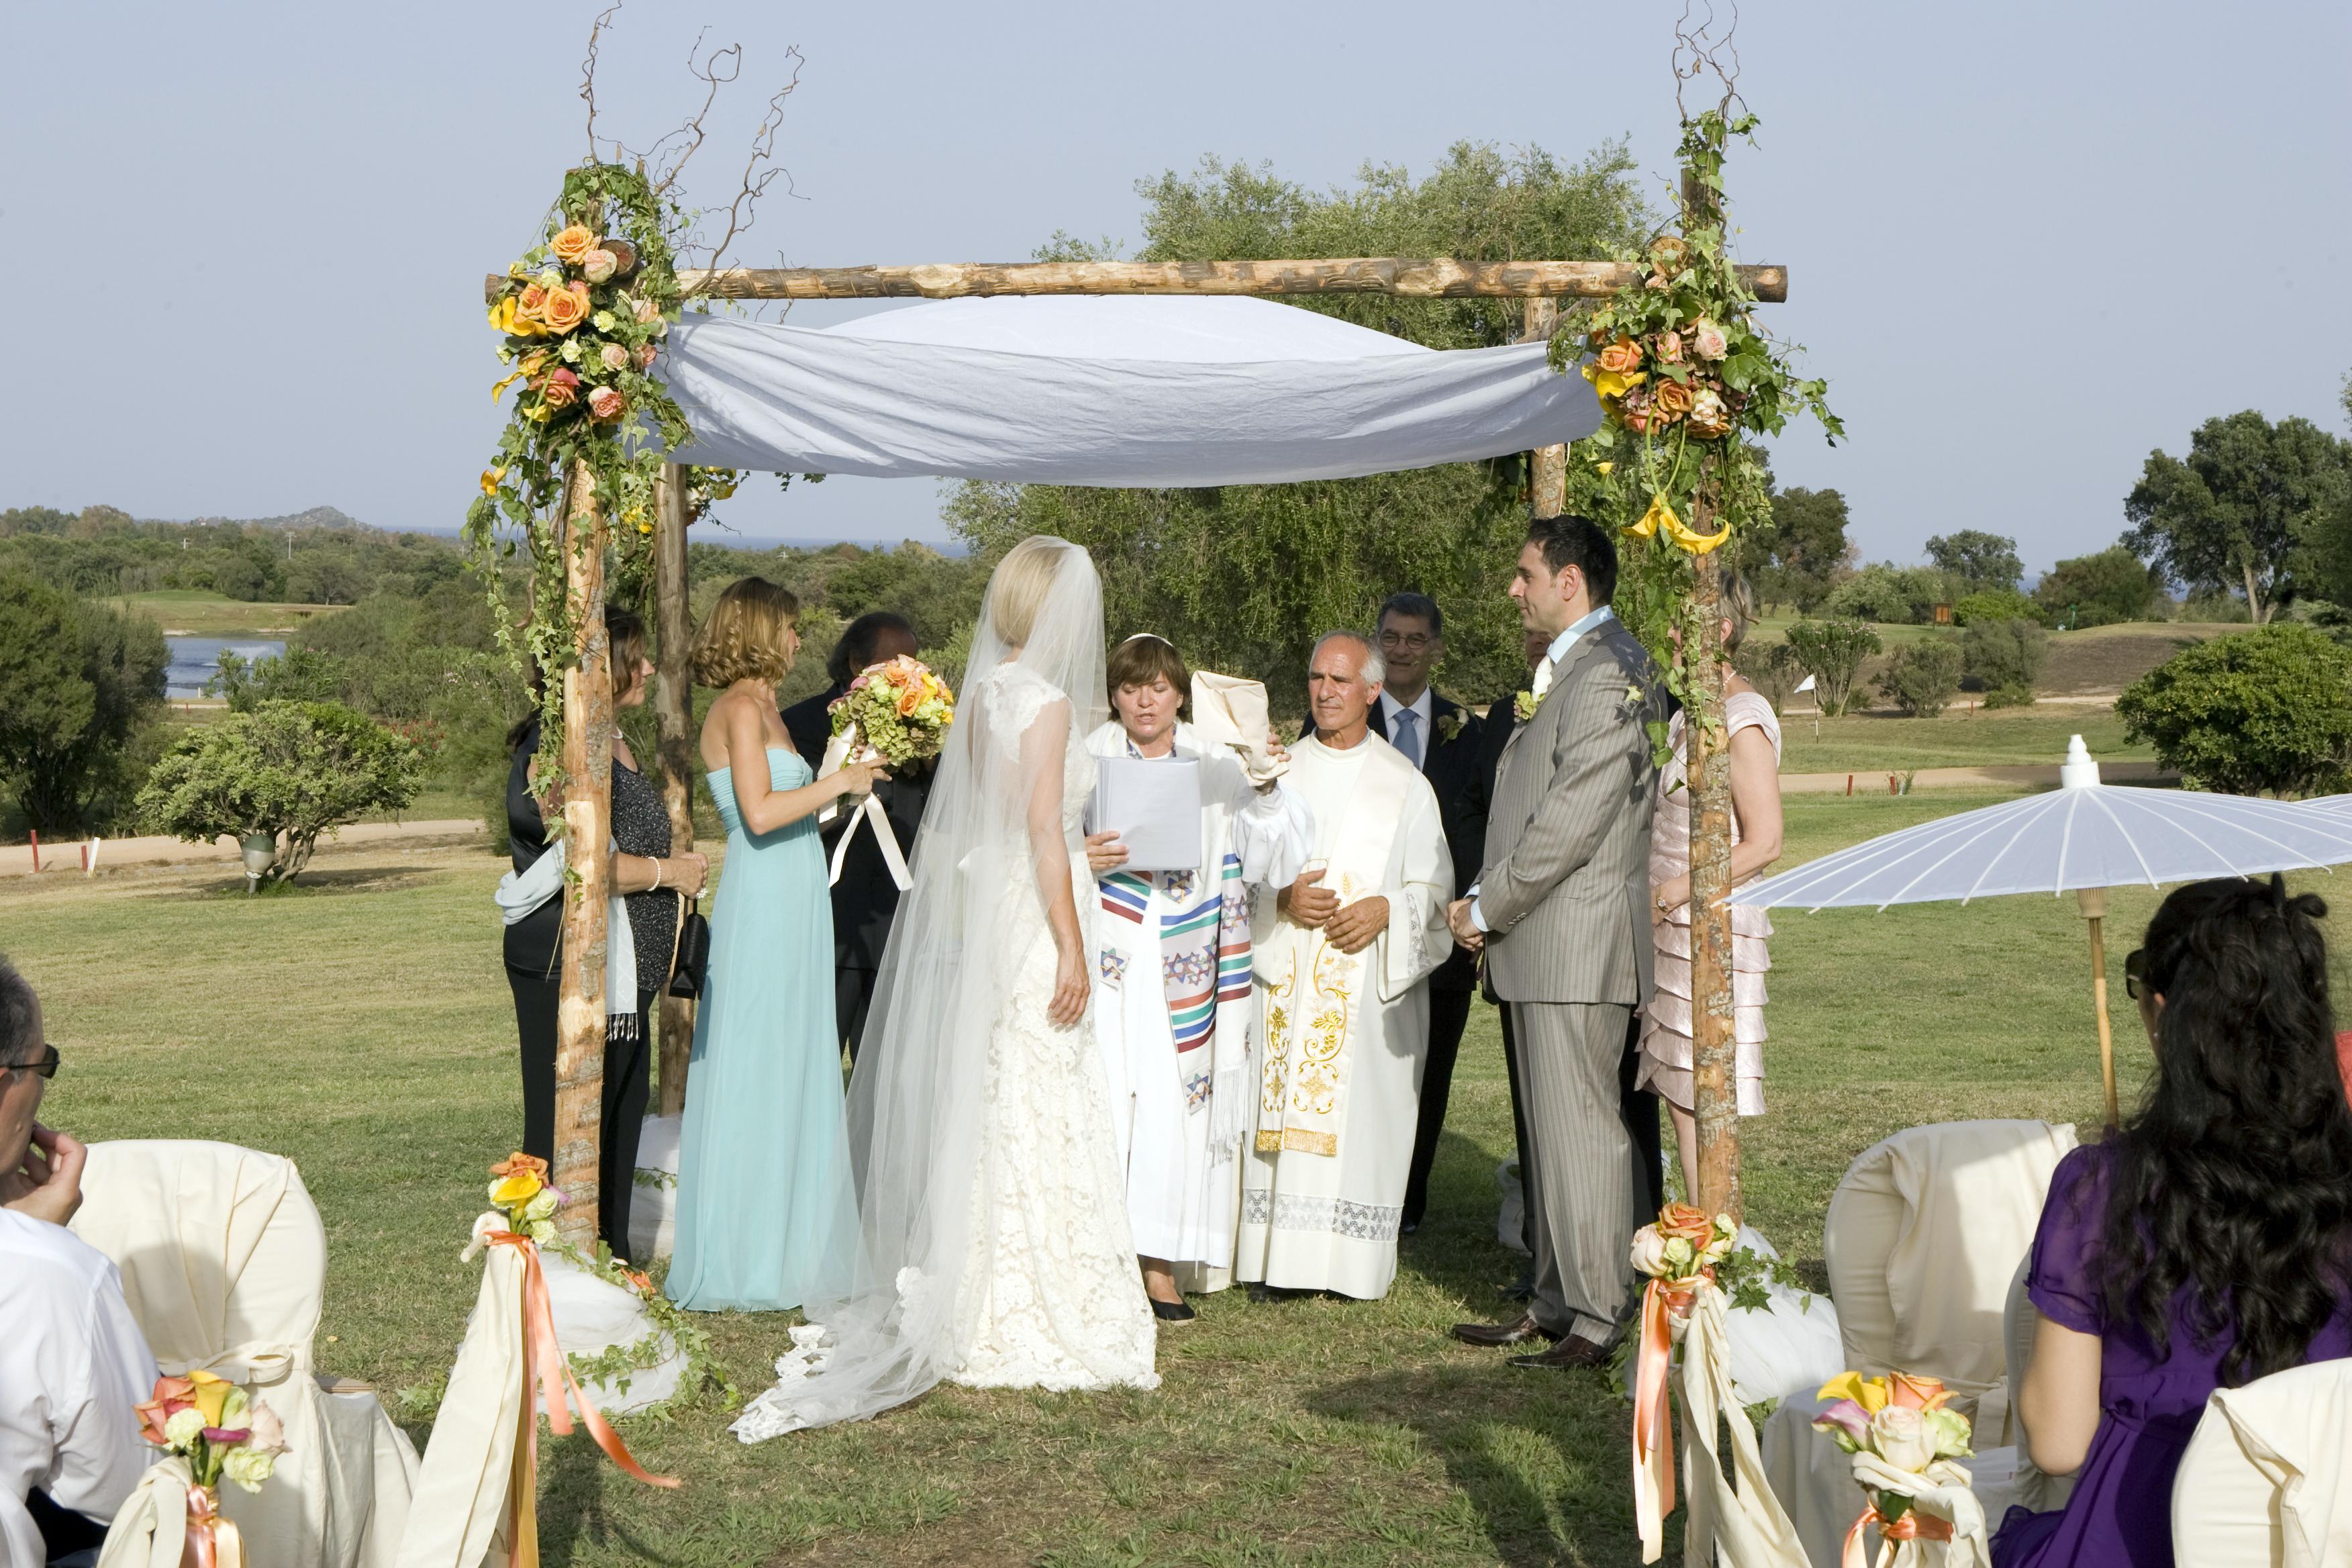 Jewish Interfaith Wedding Officiants